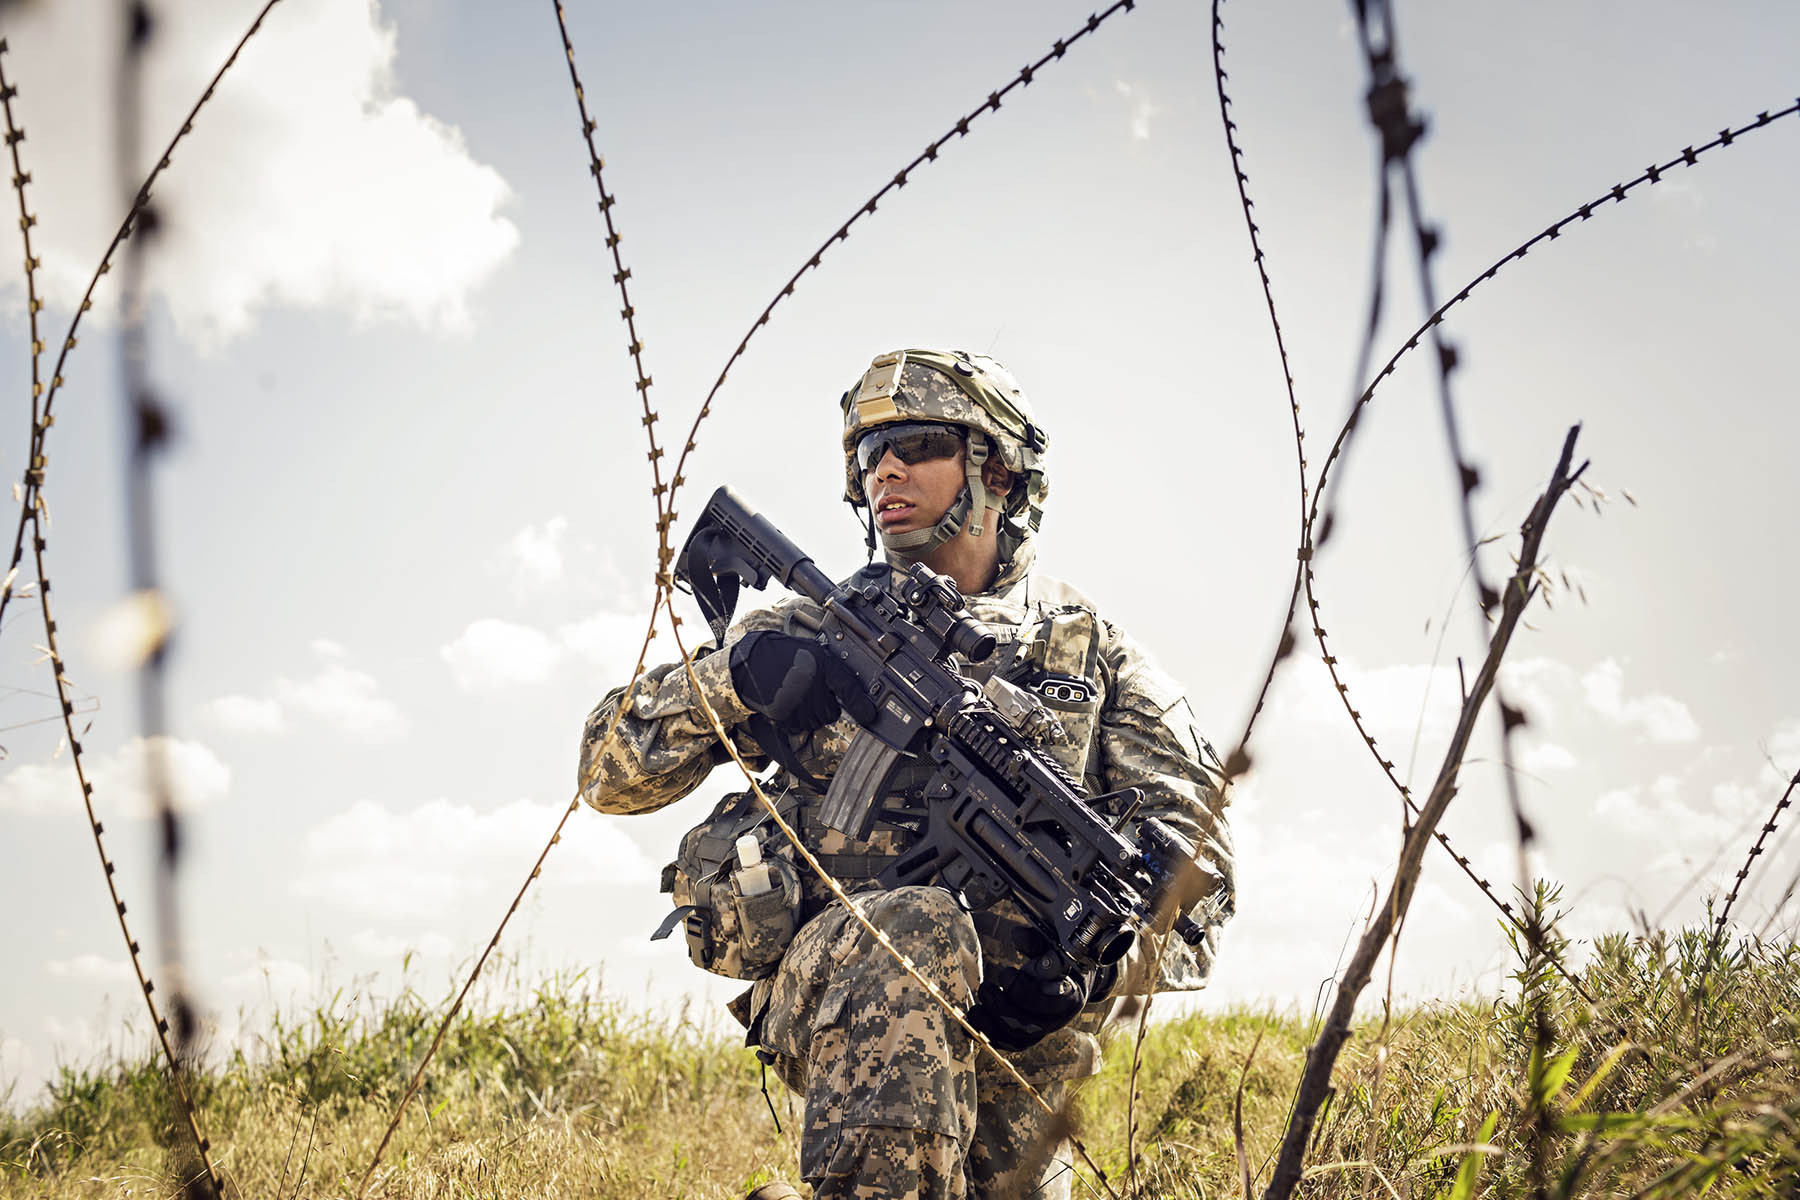 1nationalguard2.jpg